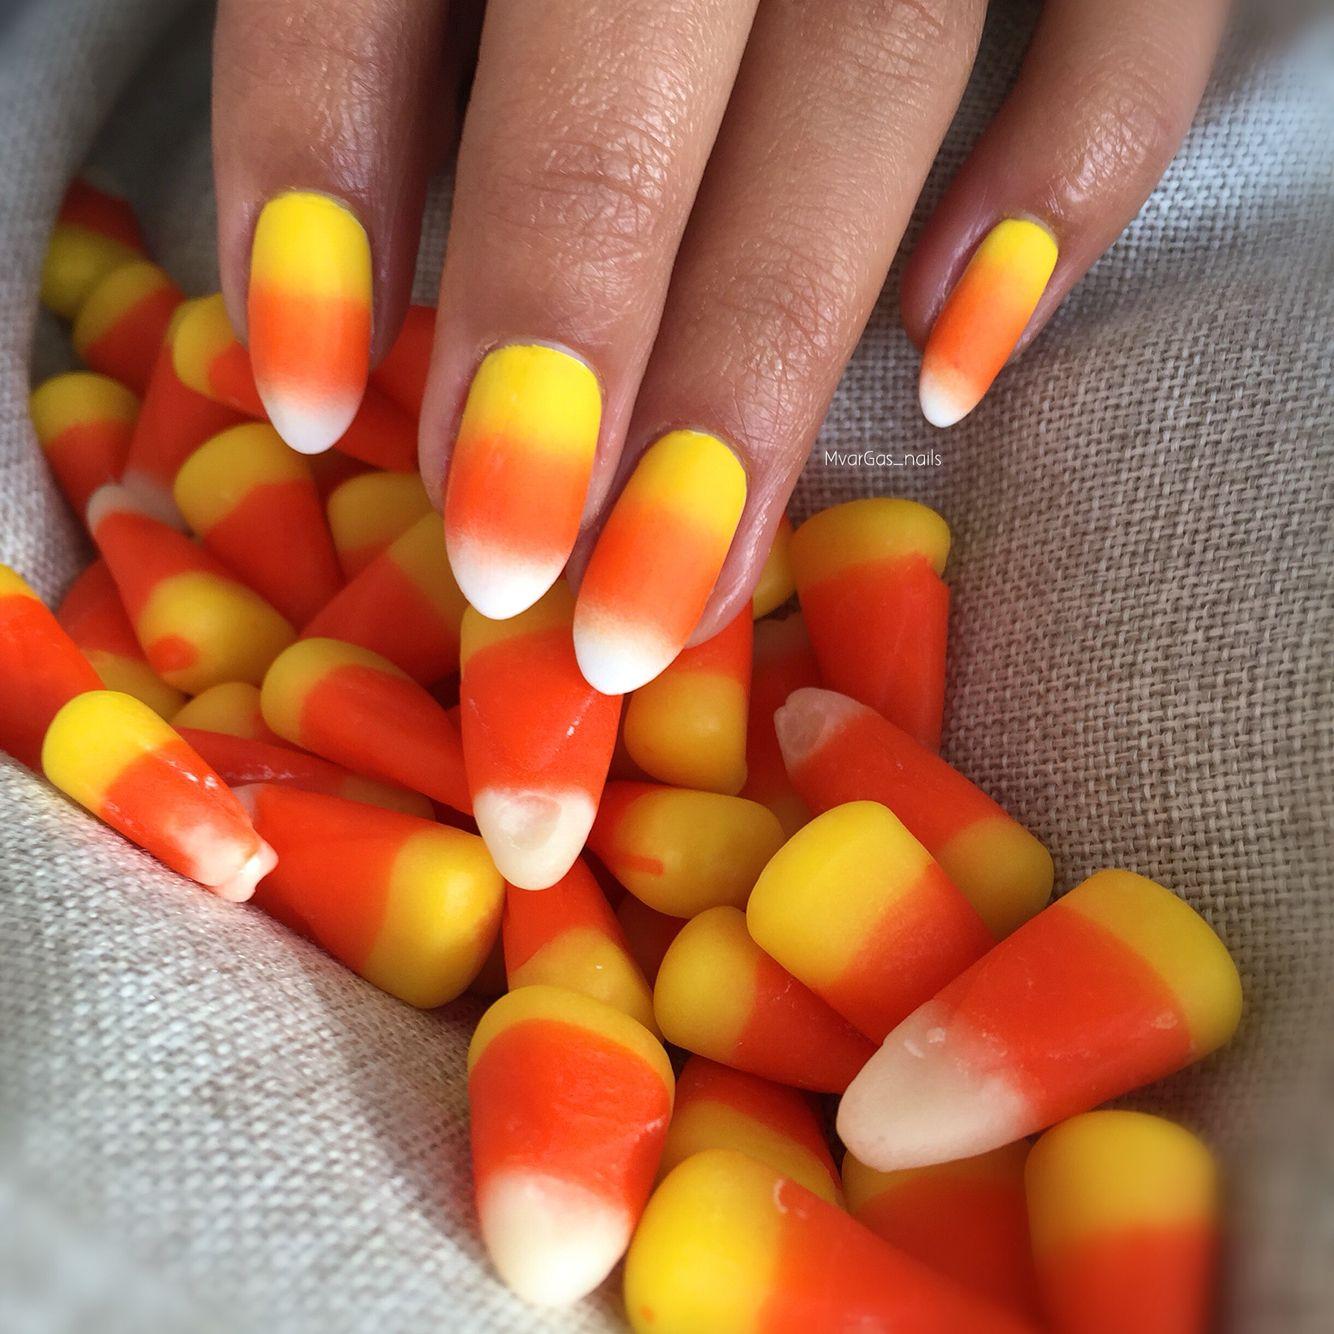 Candy corn nails🌽 | Candy corn nails, Pumpkin nails ...